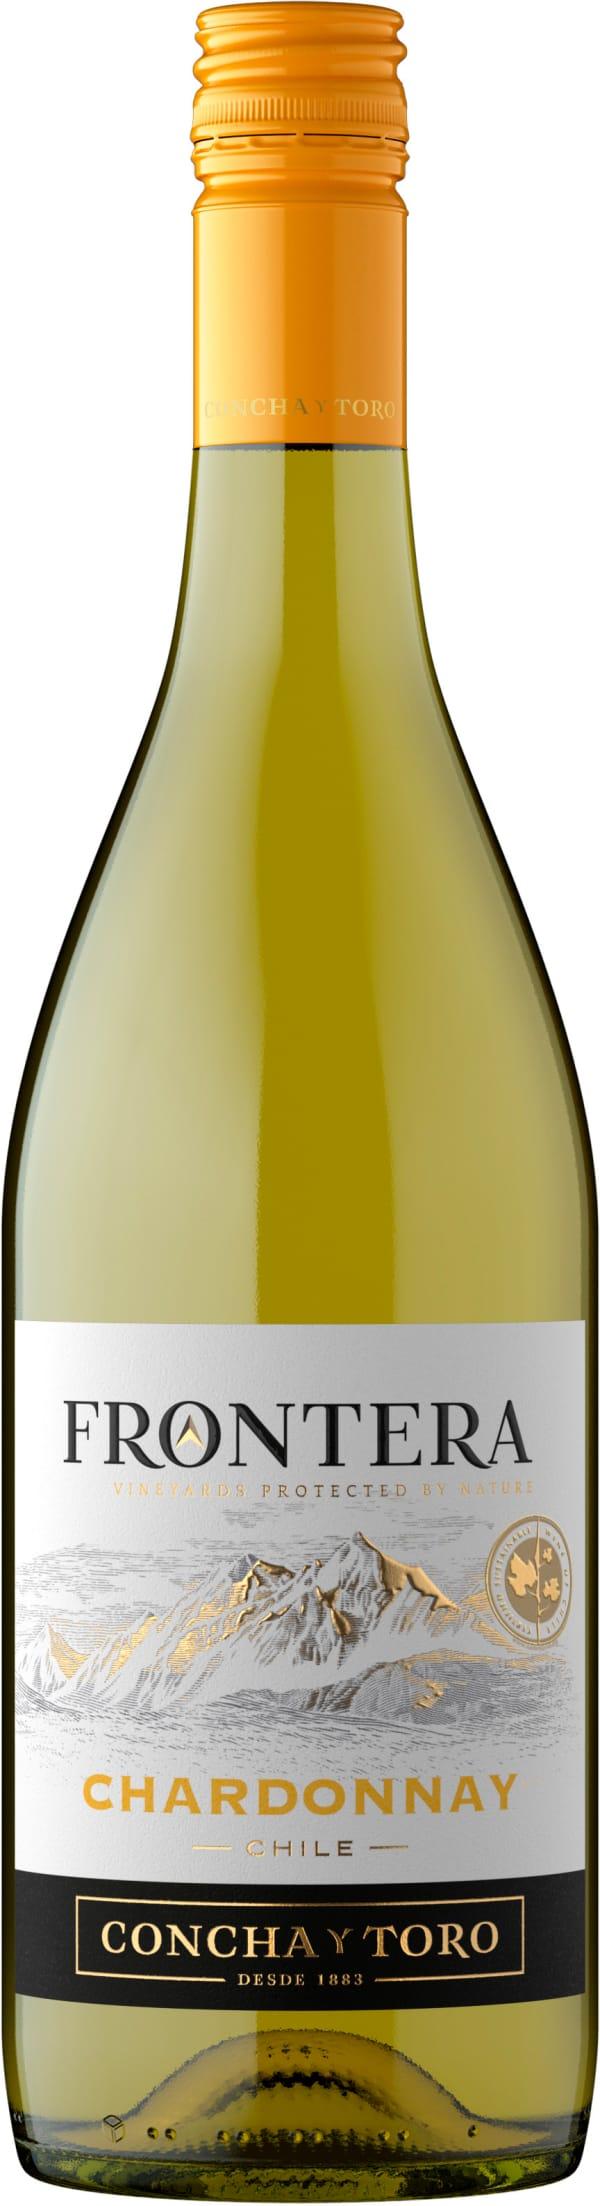 Frontera Chardonnay 2020